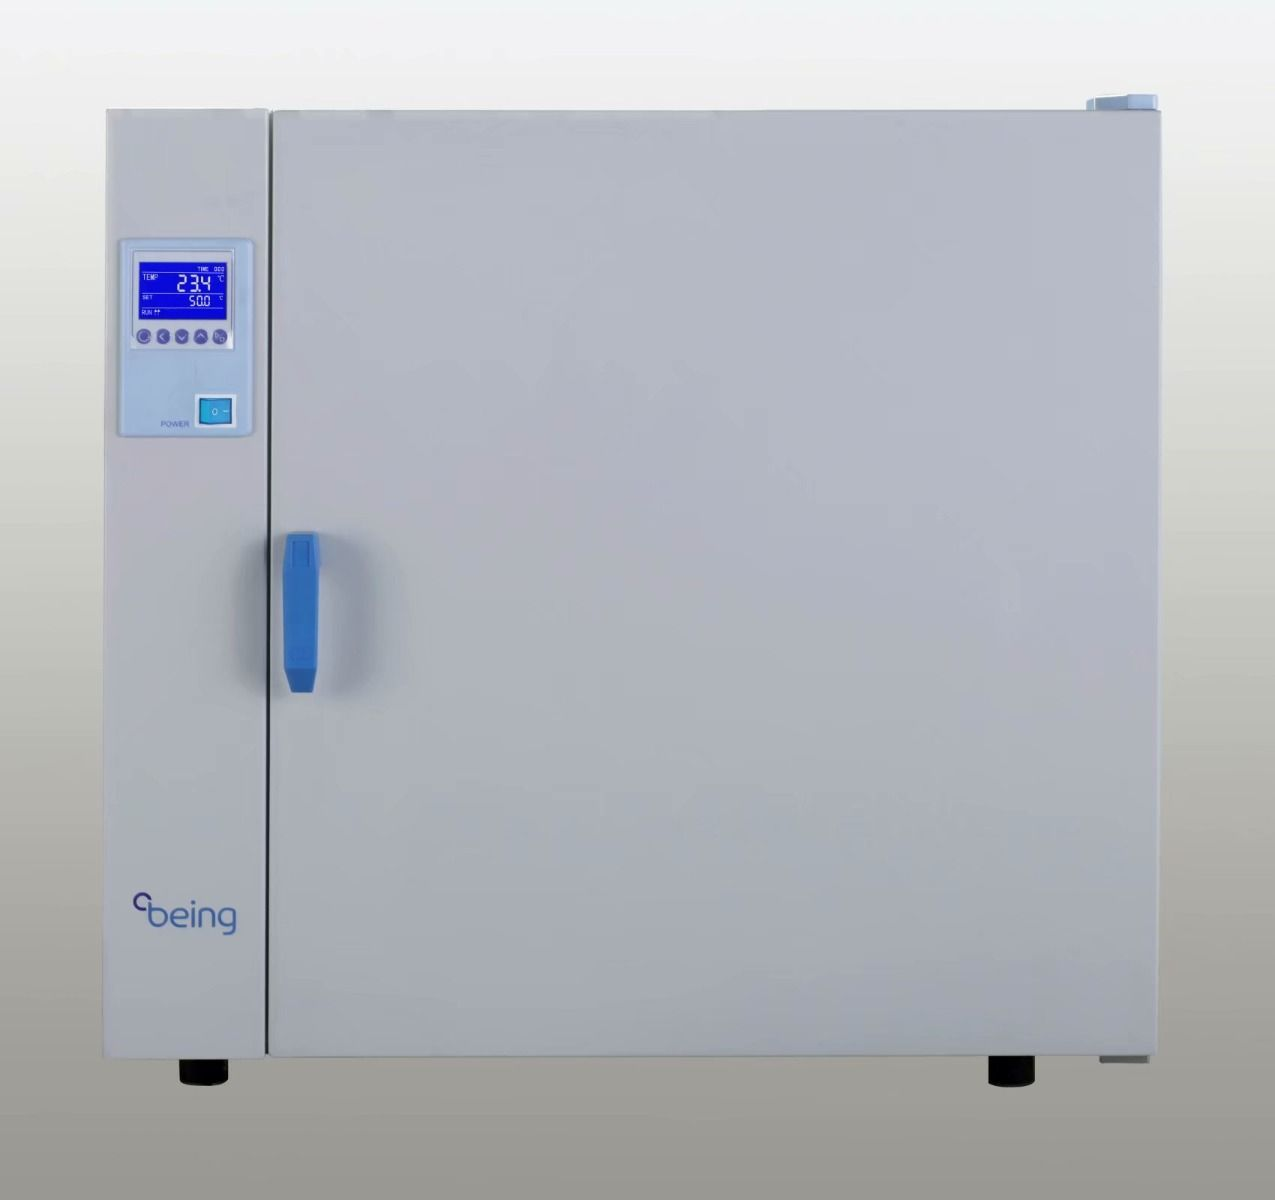 BIT-120 BEING Incubator, amb.+5℃-80℃, 123 liters